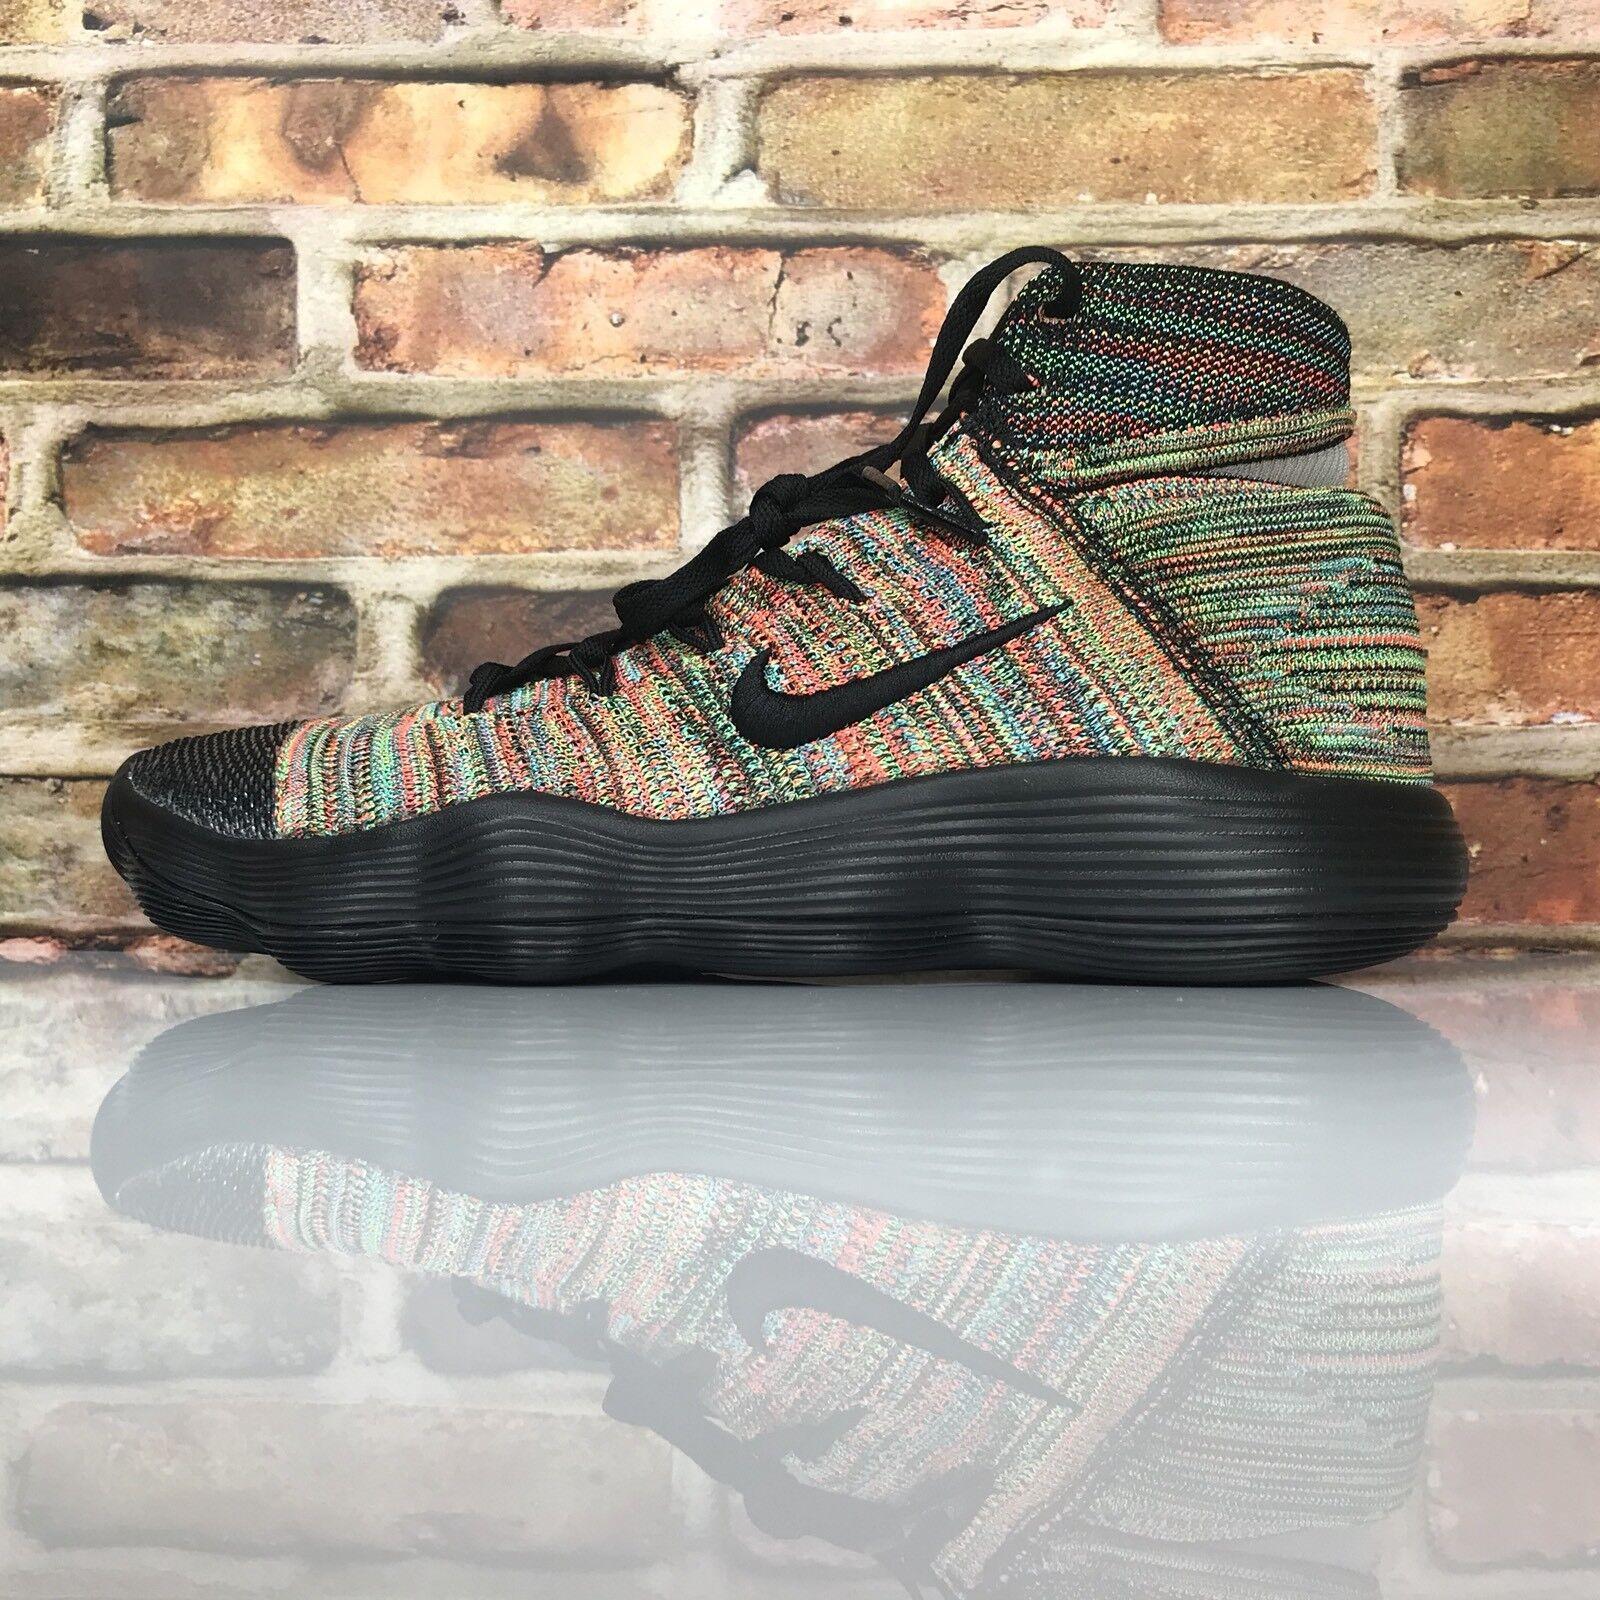 Nike Hyperdunk 2018 Flyknit Mens Shoe Size 10 Multi Color Black White 917726 006